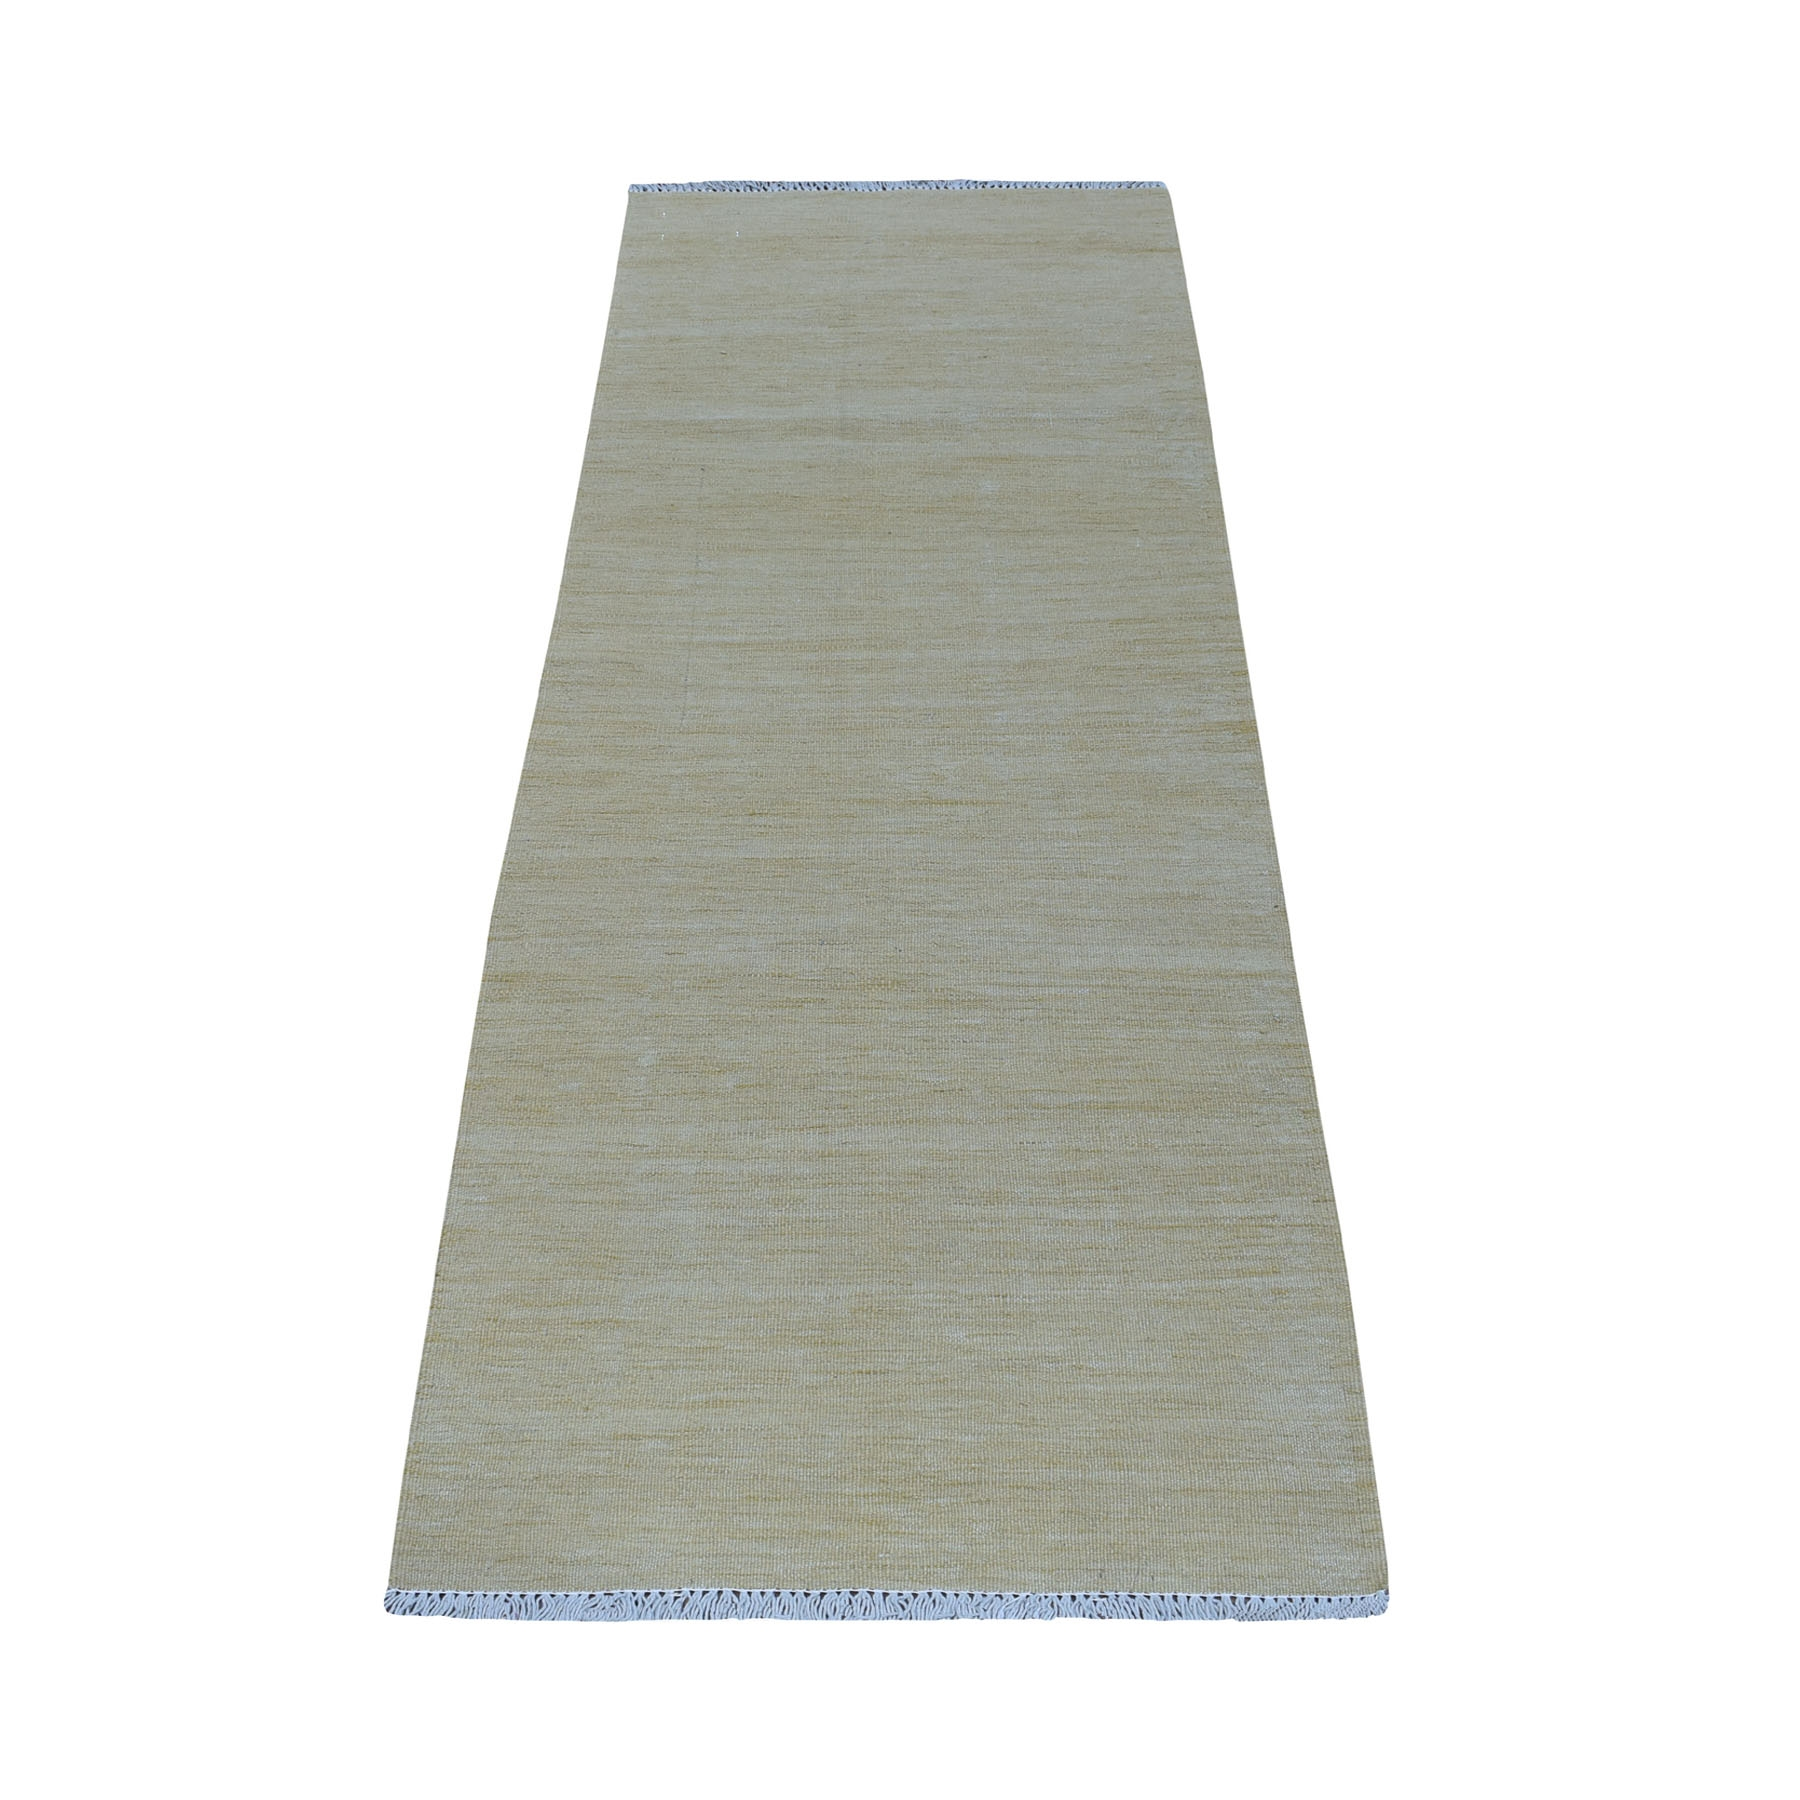 "2'2""X6'2"" Beige Shades Flat Weave Kilim Pure Wool Hand Woven Runner Rug moaec860"